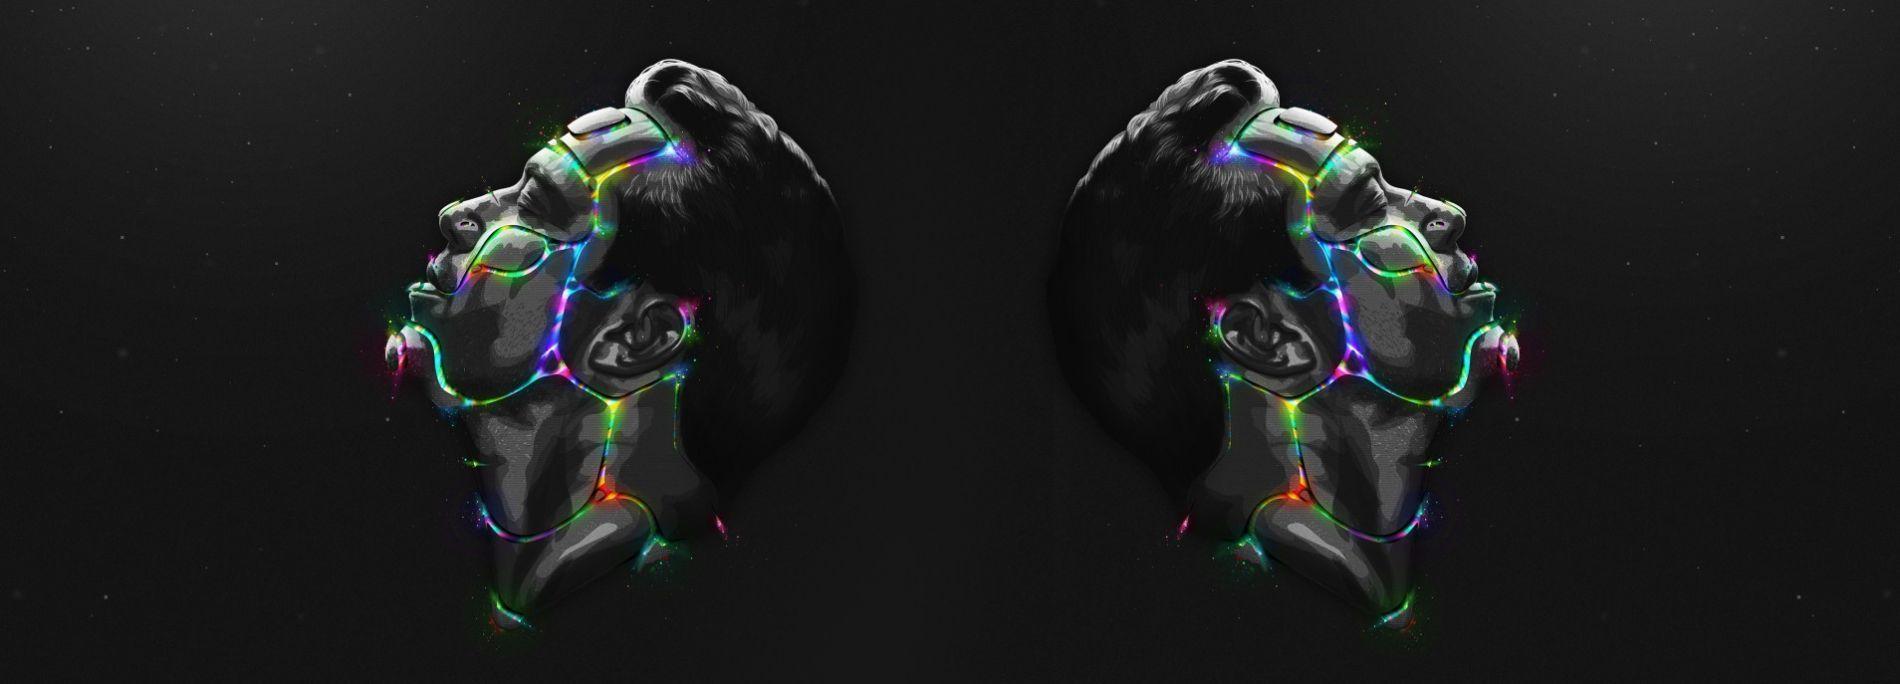 Pre-save Purple Haze his album SPECTRVM